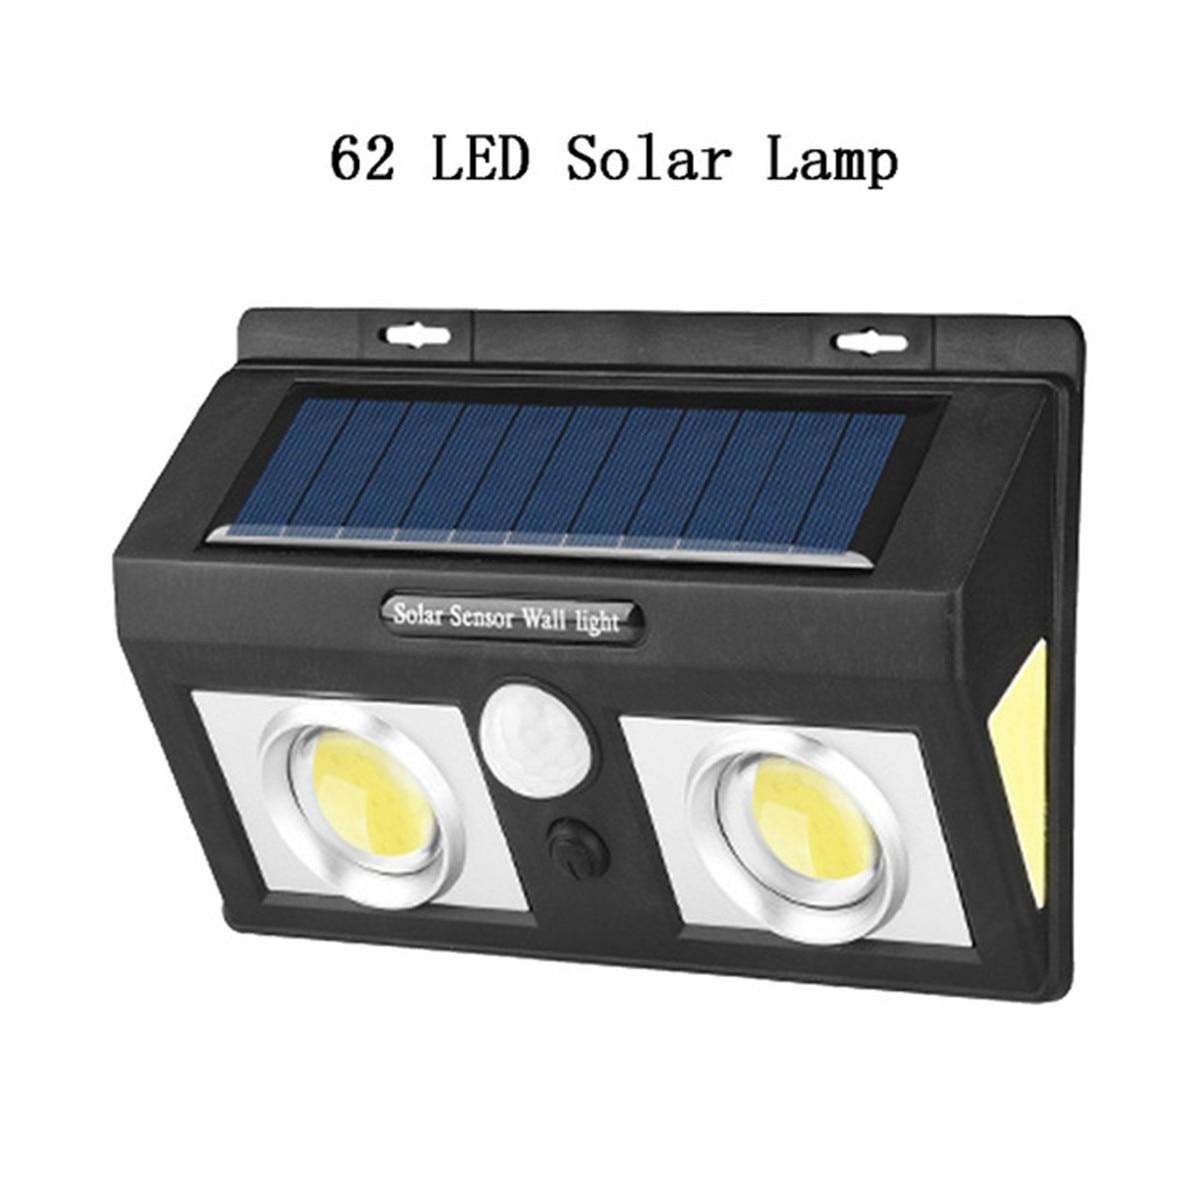 62 LEDs Solar Light Outdoor Solar Lamp PIR Motion Sensor Wall Light Waterproof Solar Powered Sunlight For Garden Light